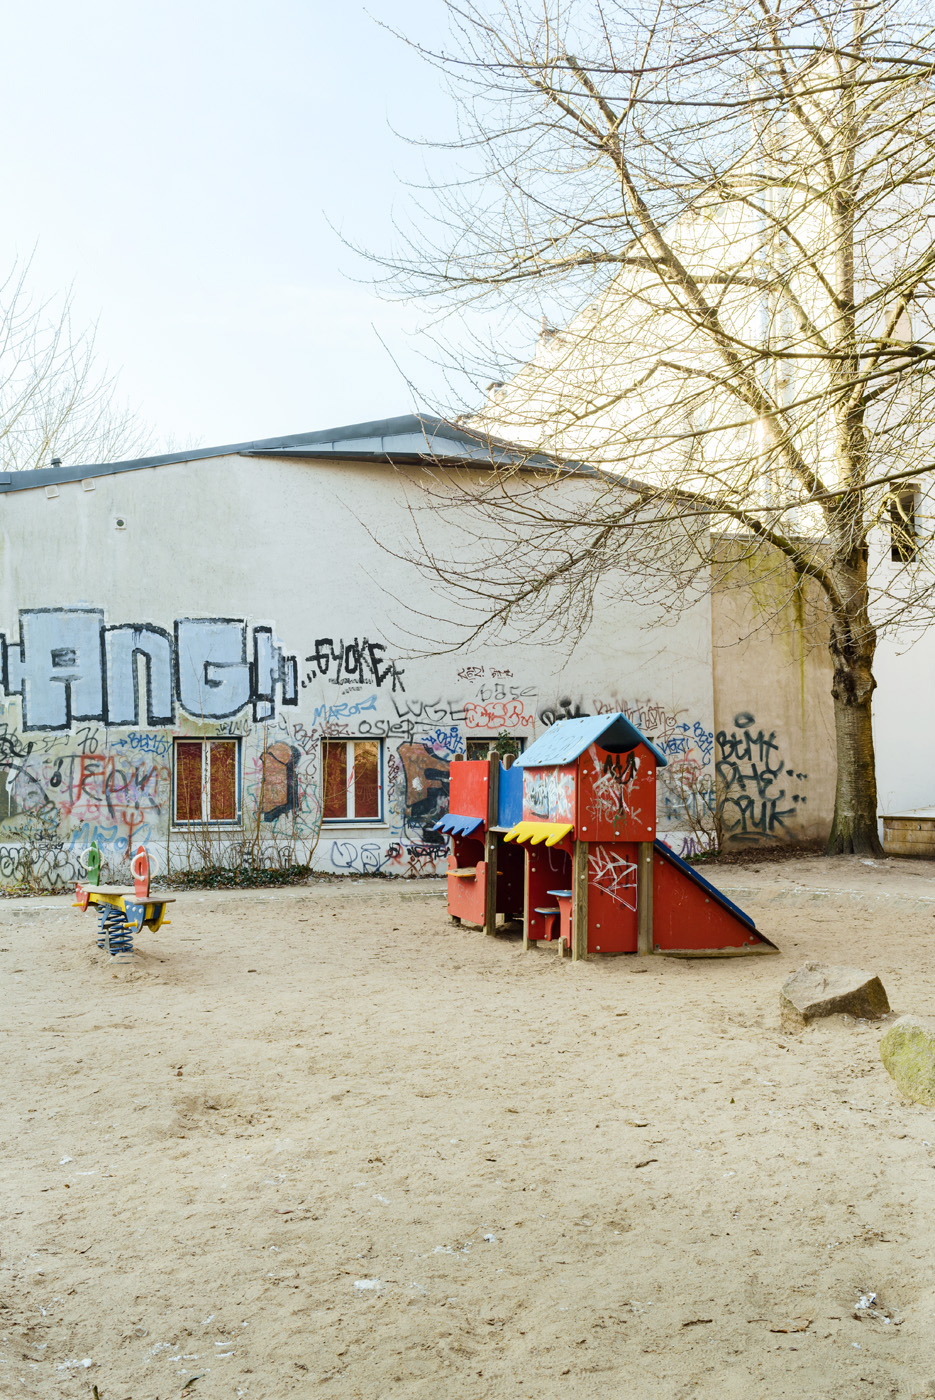 Spielplatz Arnoldstr-3133 Kopie.jpg